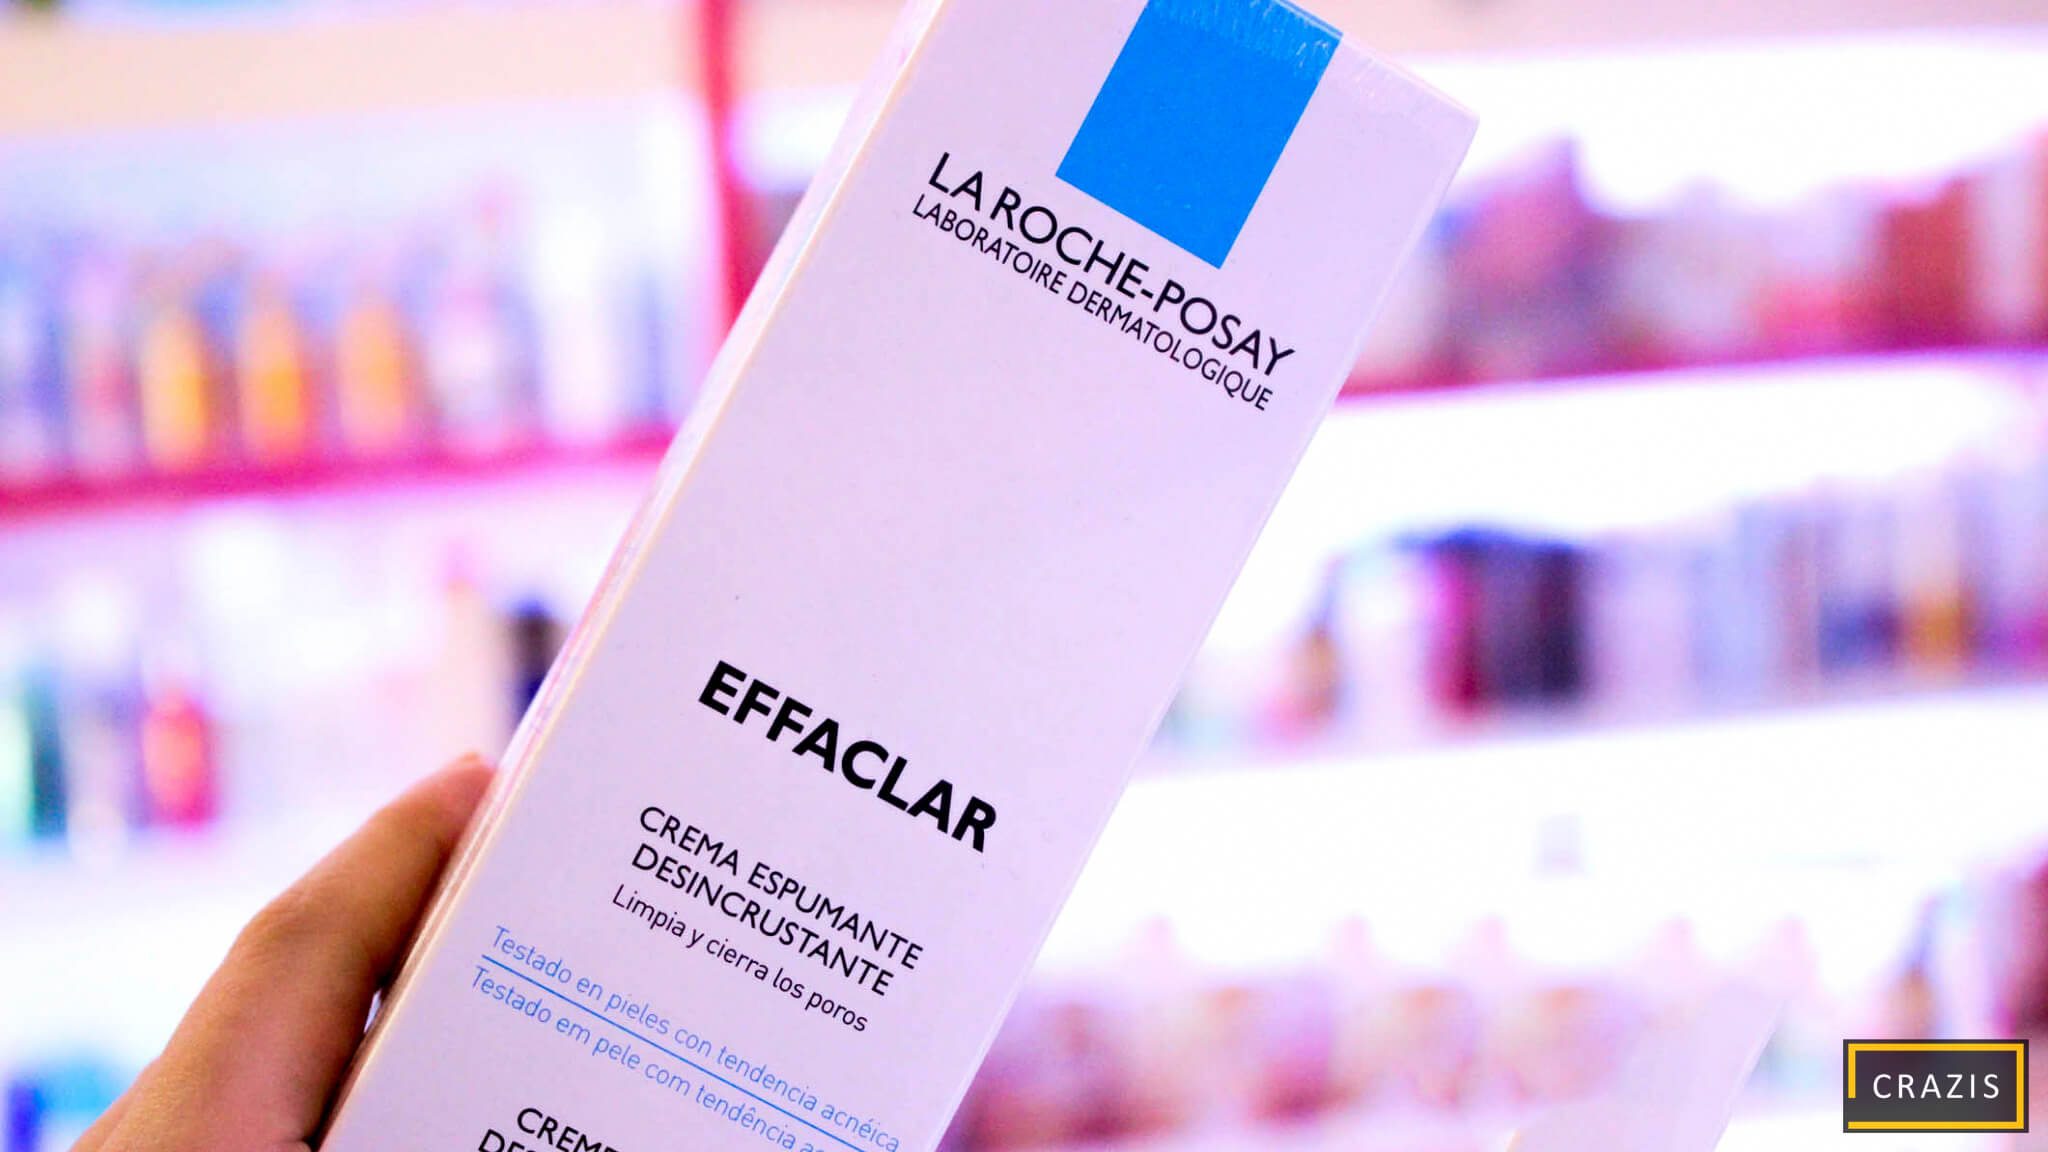 Sữa rửa mặt La Roche posay dành cho da nhạy cảm